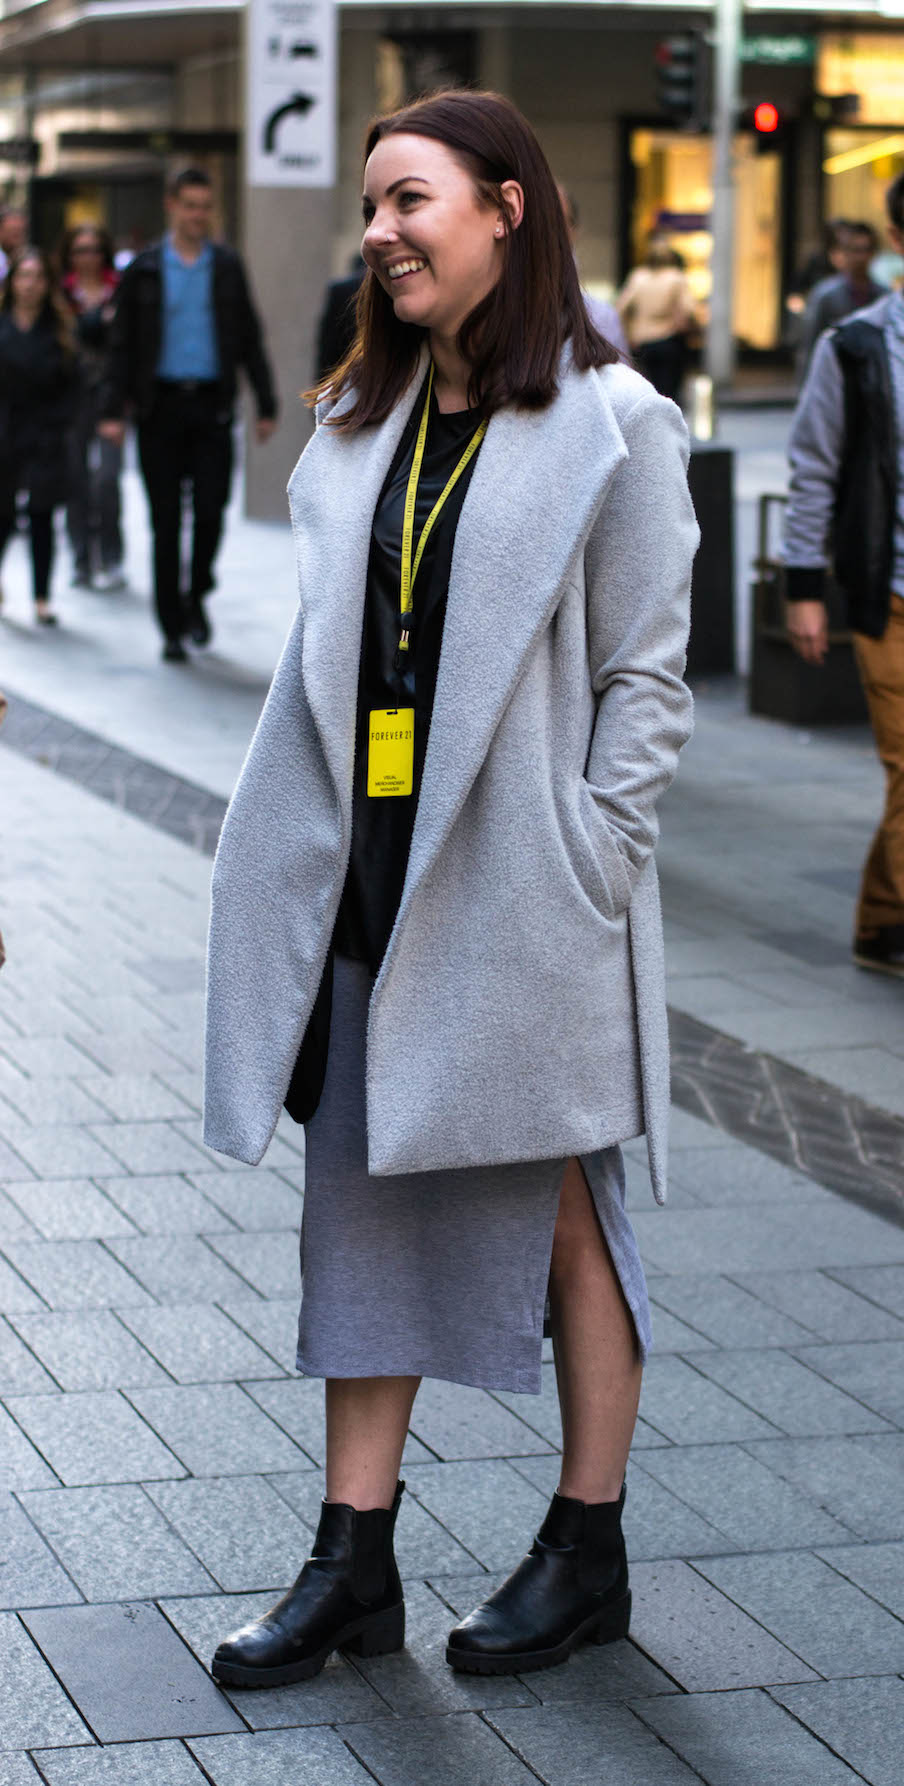 NSW: Nicole Wrigley, visual manager, Pitt St. Photo: Alice Scriberras